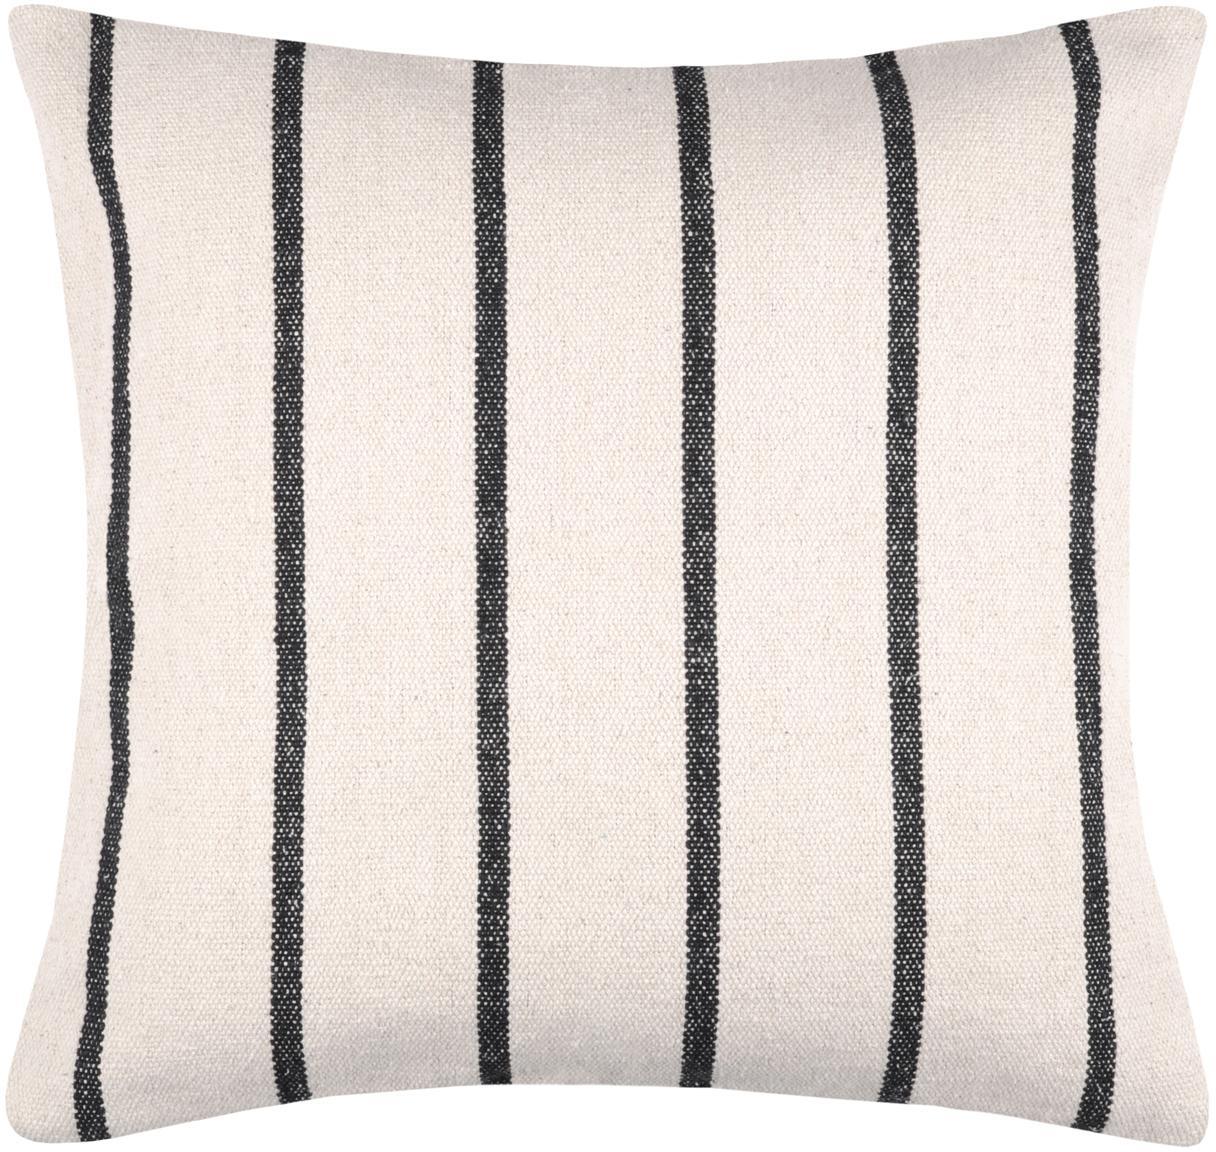 Cojín St Trop, con relleno, Funda: 100%algodón, Negro, blanco, An 50 x L 50 cm